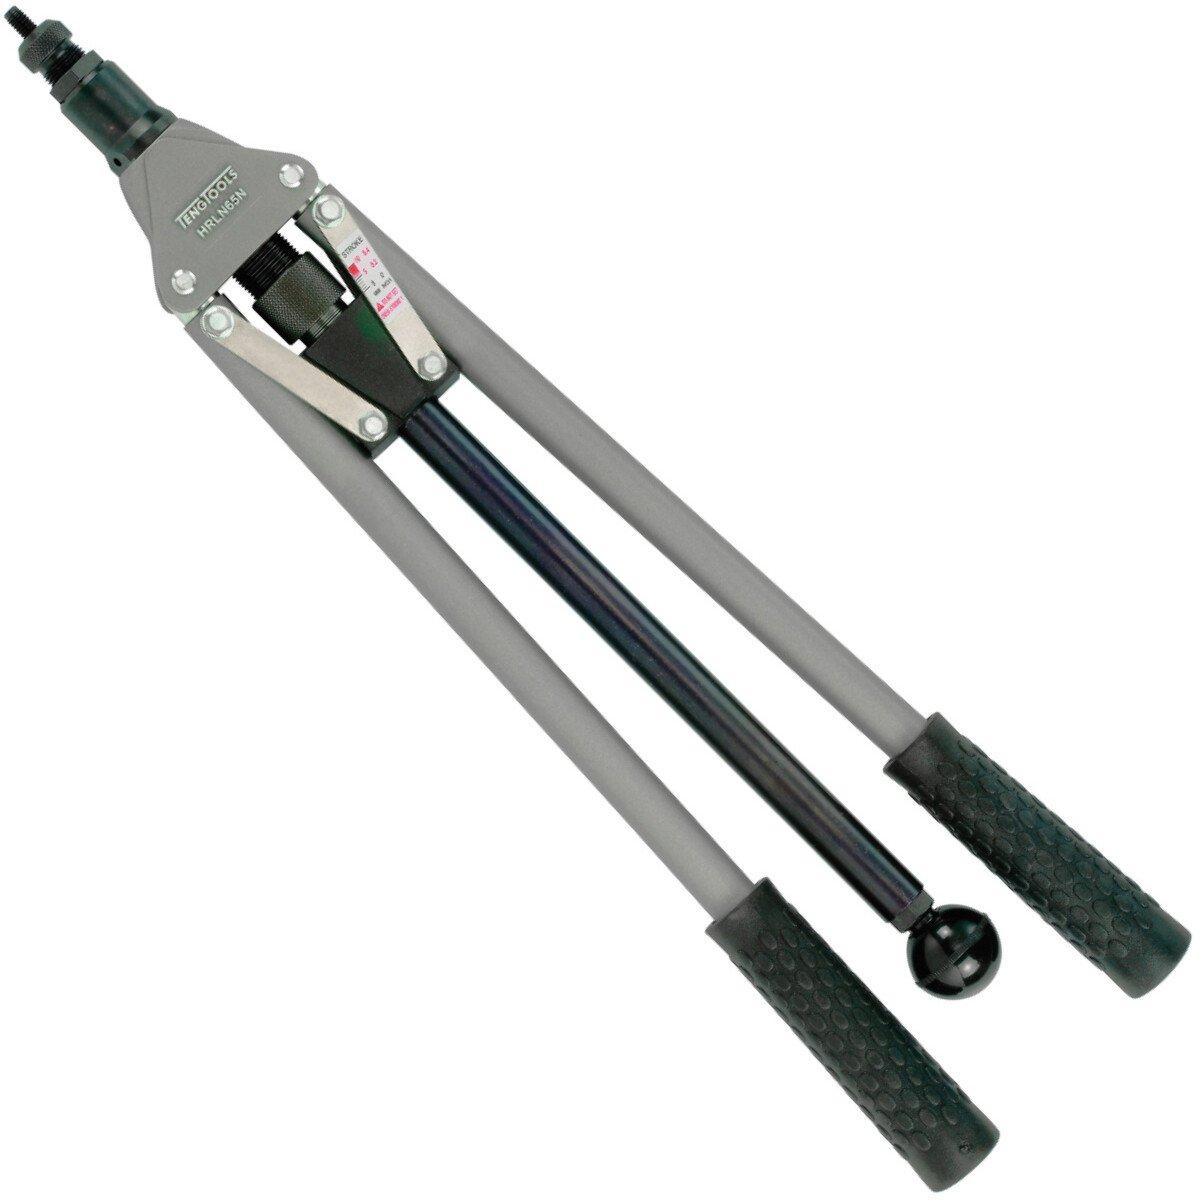 Teng Tools HRLN65N Construction and Industrial Nutsert Riveting Tool